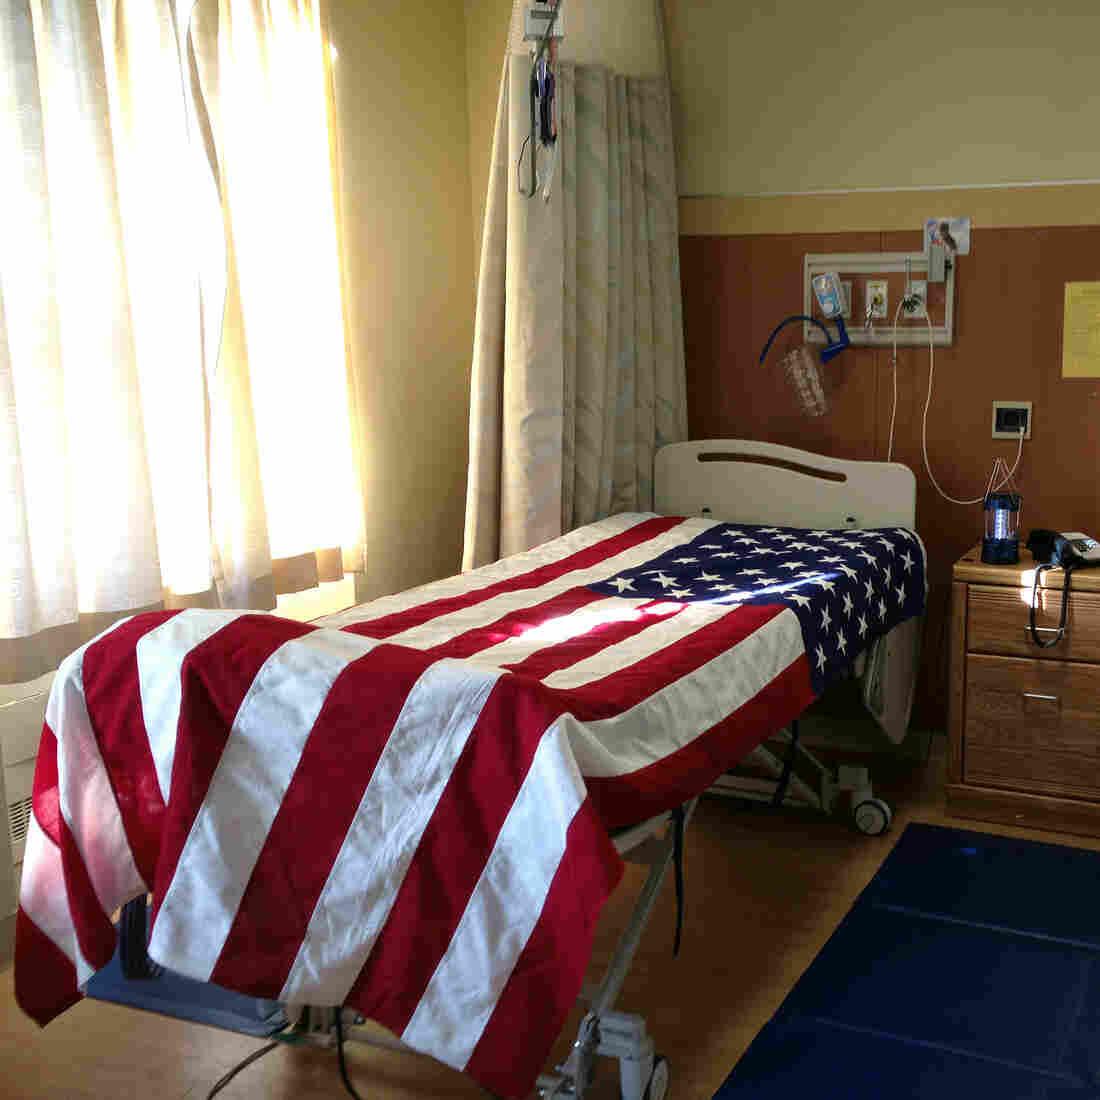 VA Steps Up Programs As More Veterans Enter Hospice Care